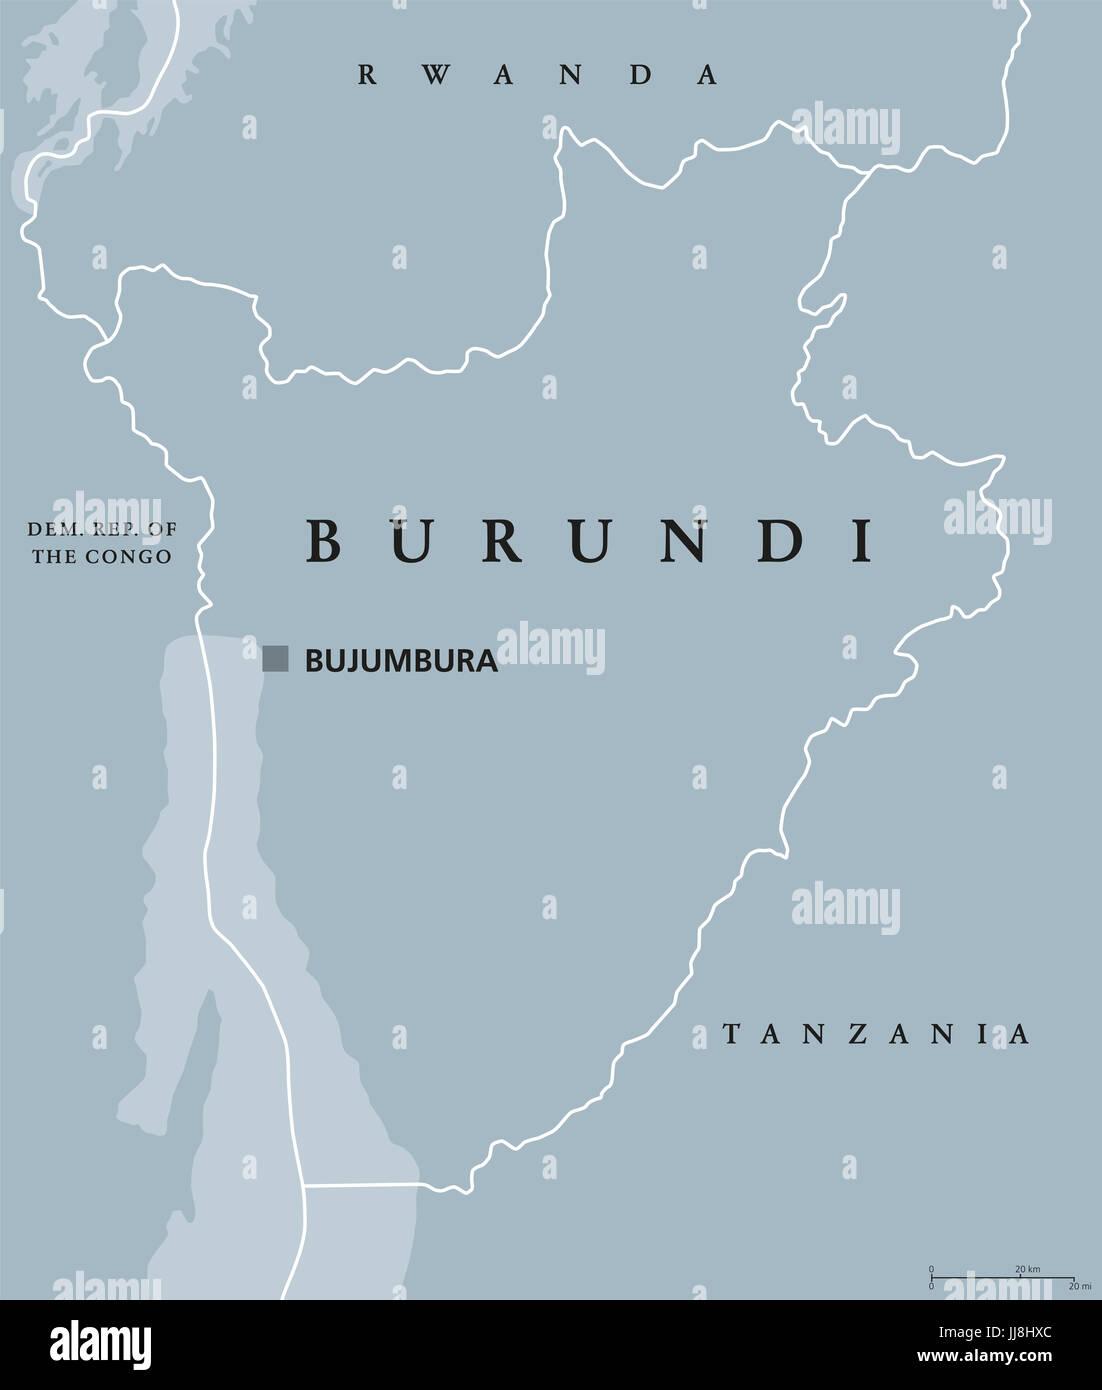 Burundi political map with capital Bujumbura and international Stock